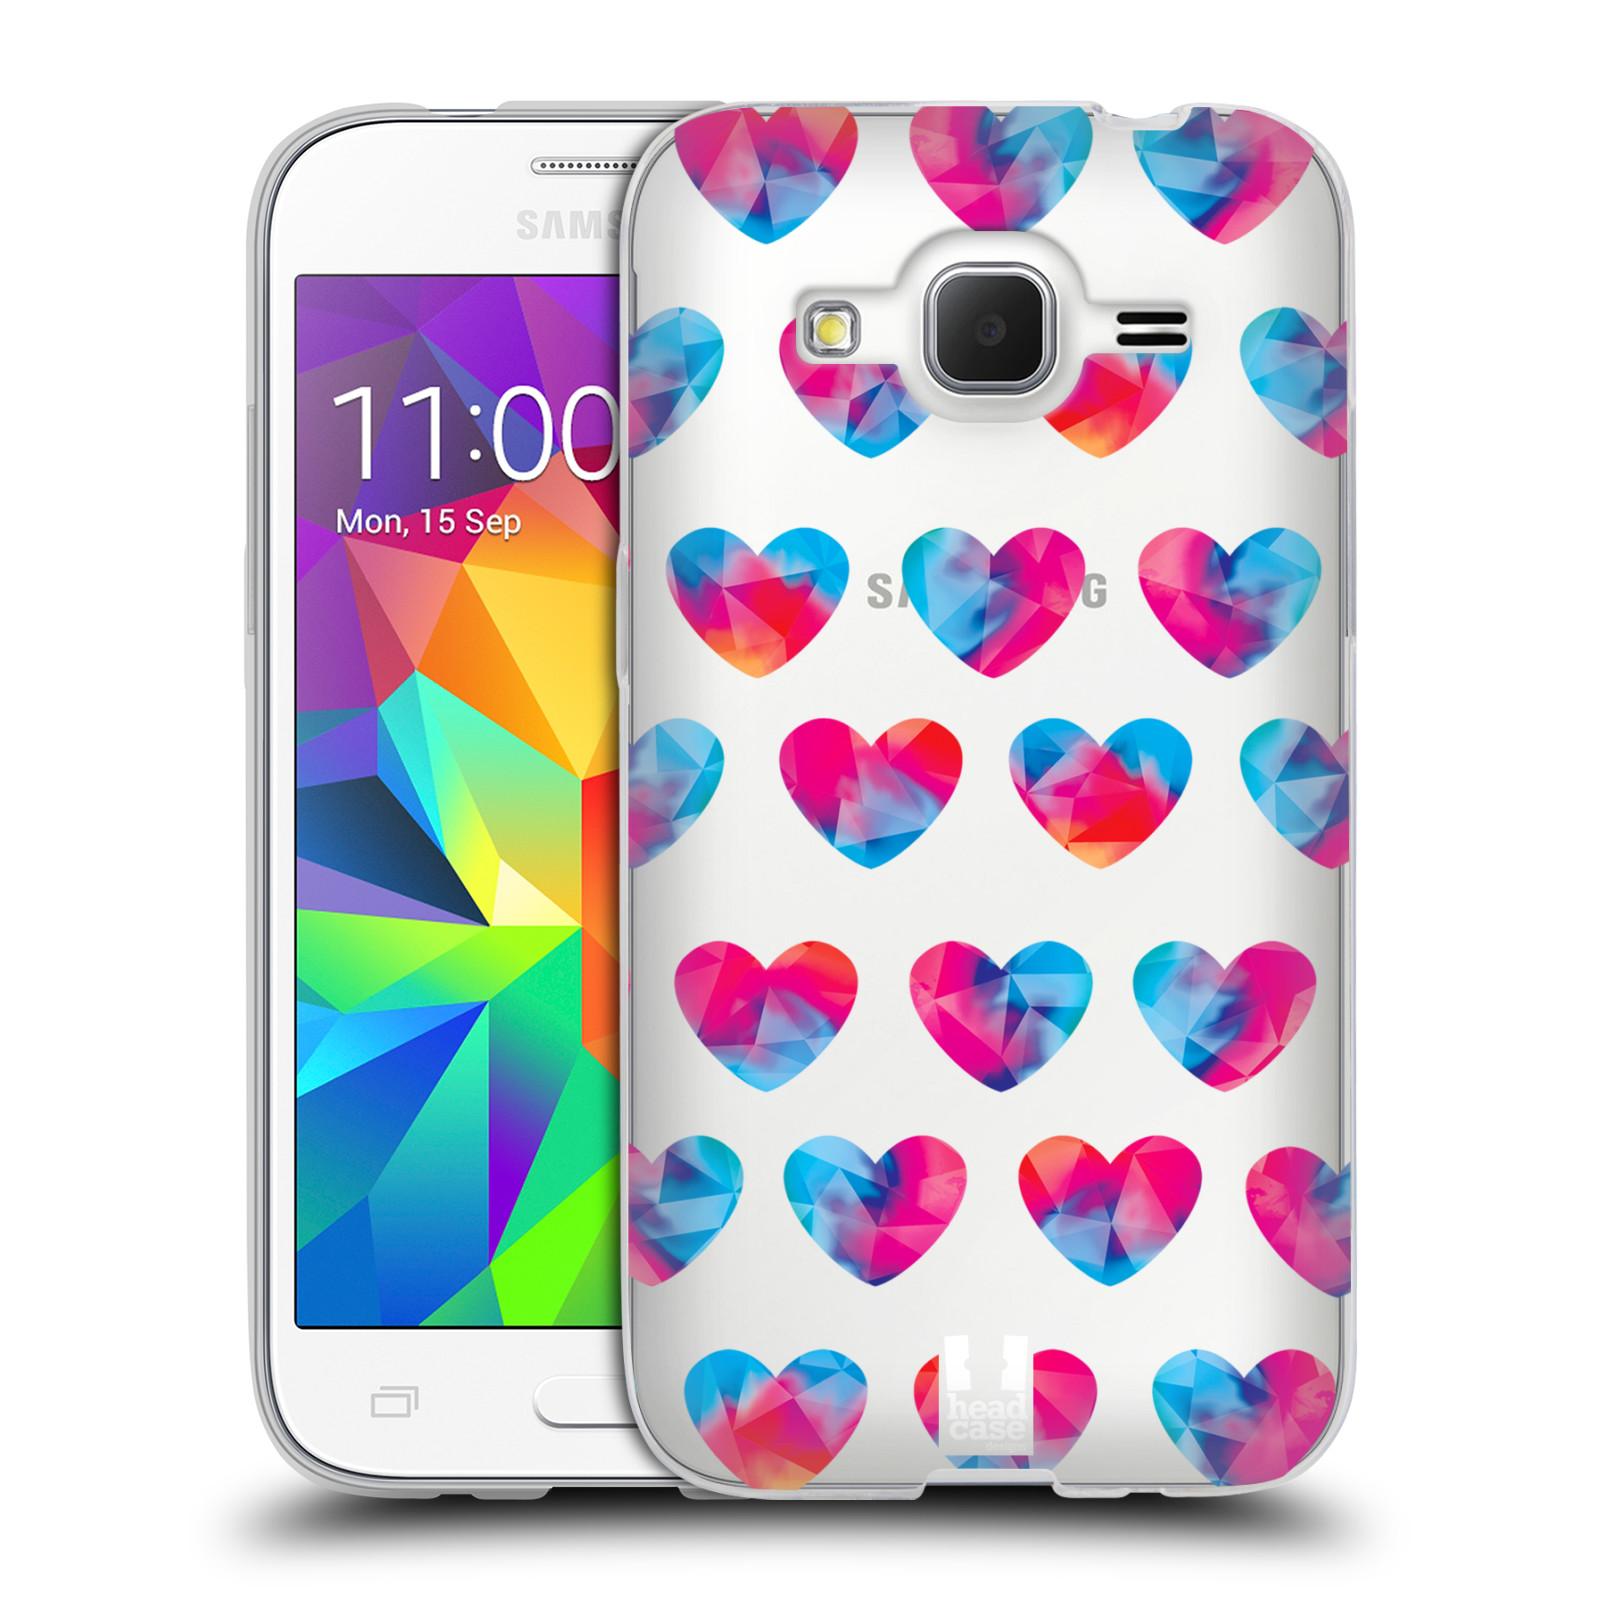 Silikonové pouzdro na mobil Samsung Galaxy Core Prime LTE - Head Case - Srdíčka hrající barvami